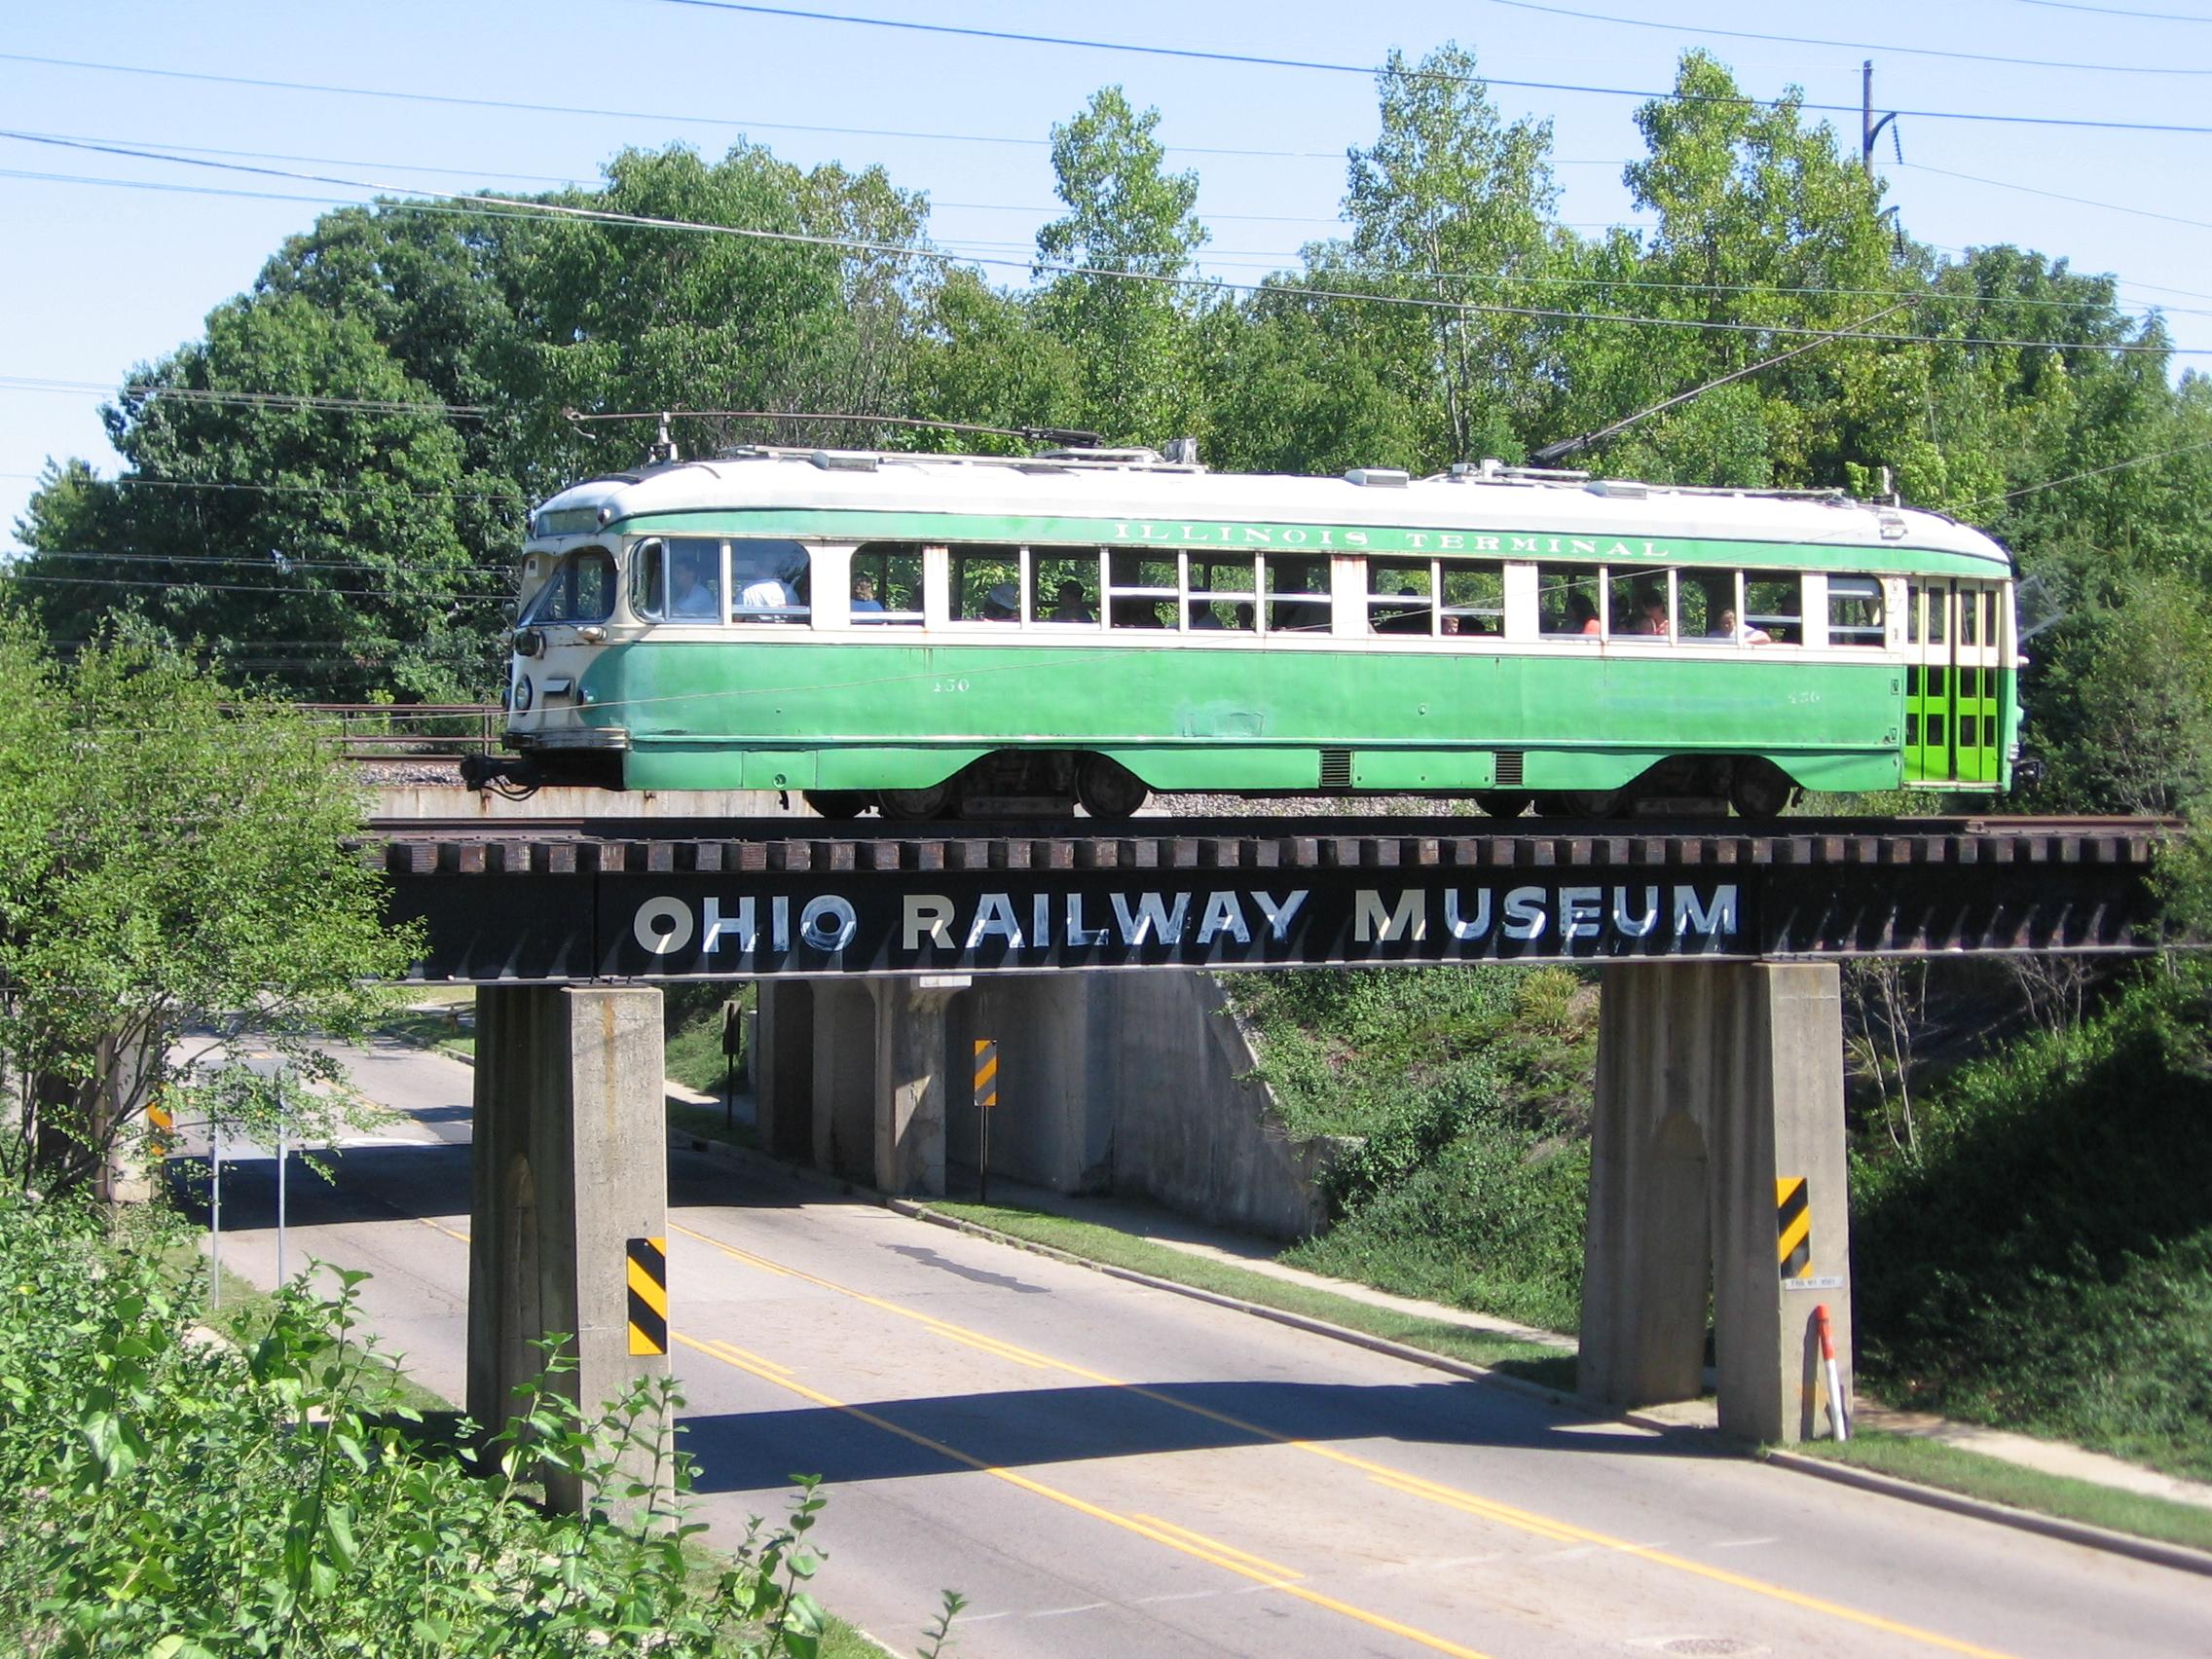 PCC streetcar 450 operating on the Ohio Railway Museum line